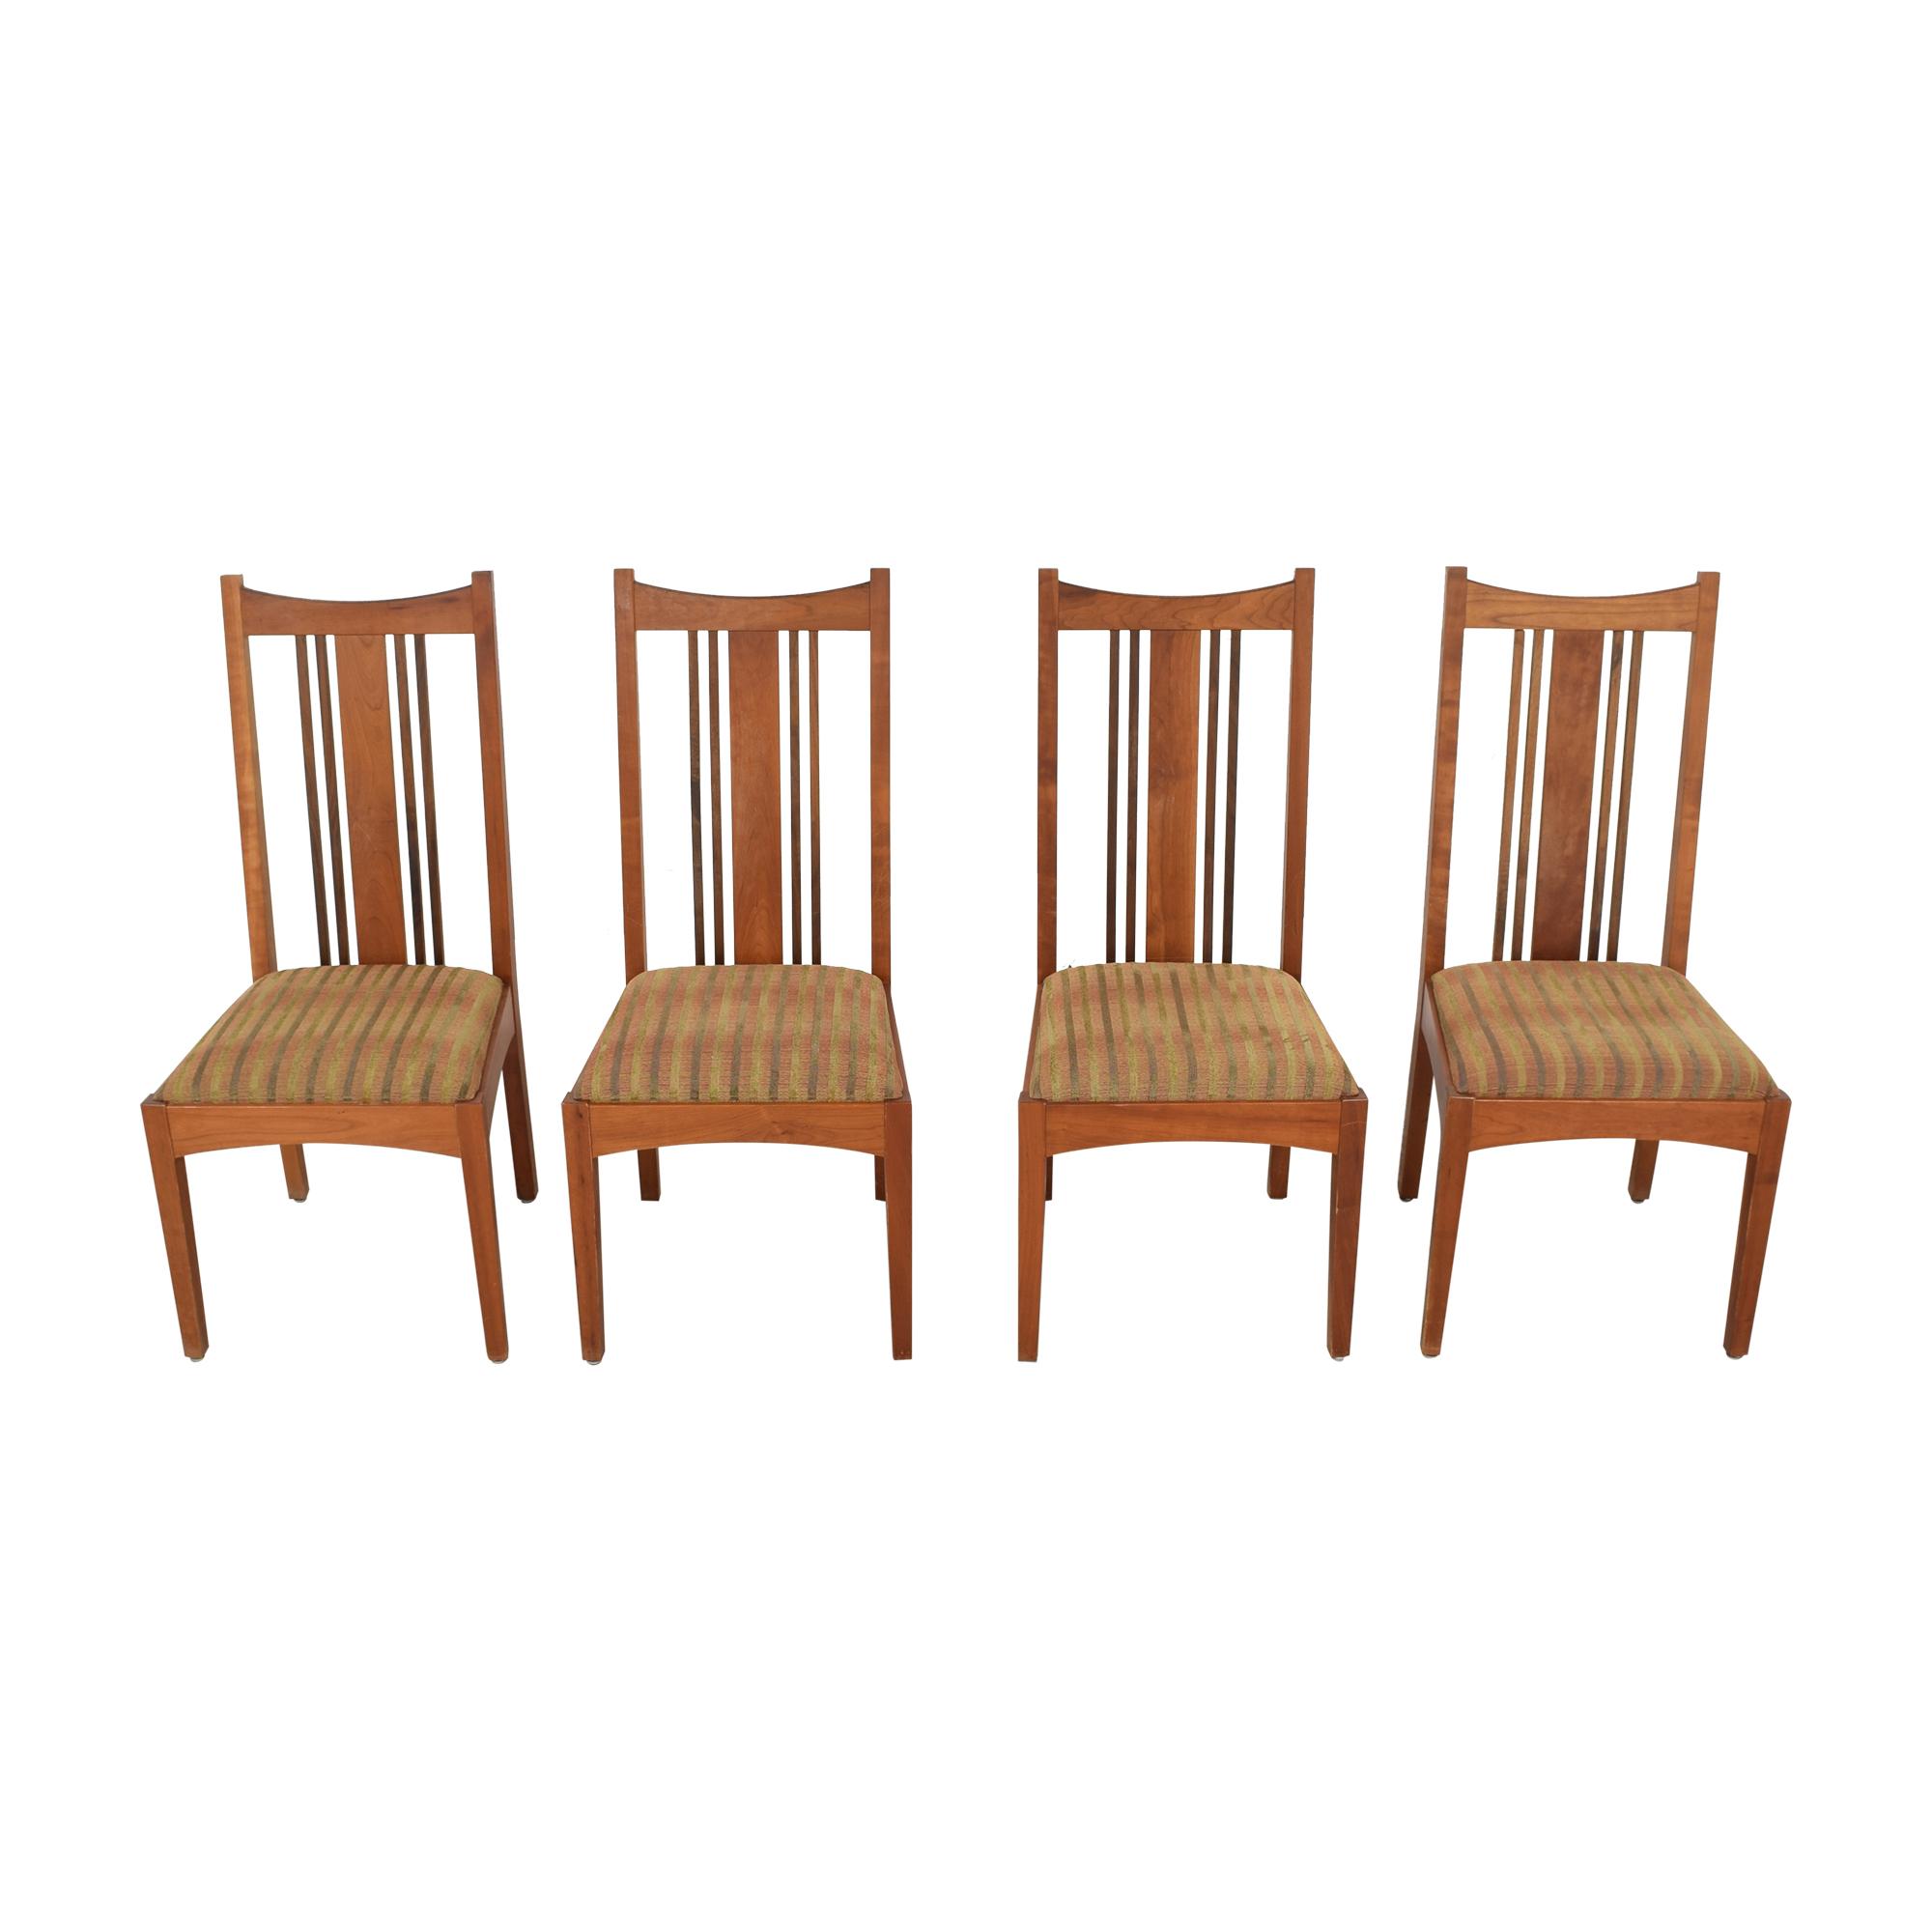 Stickley Furniture Stickley Furniture Metropolitan Side Chair Chairs